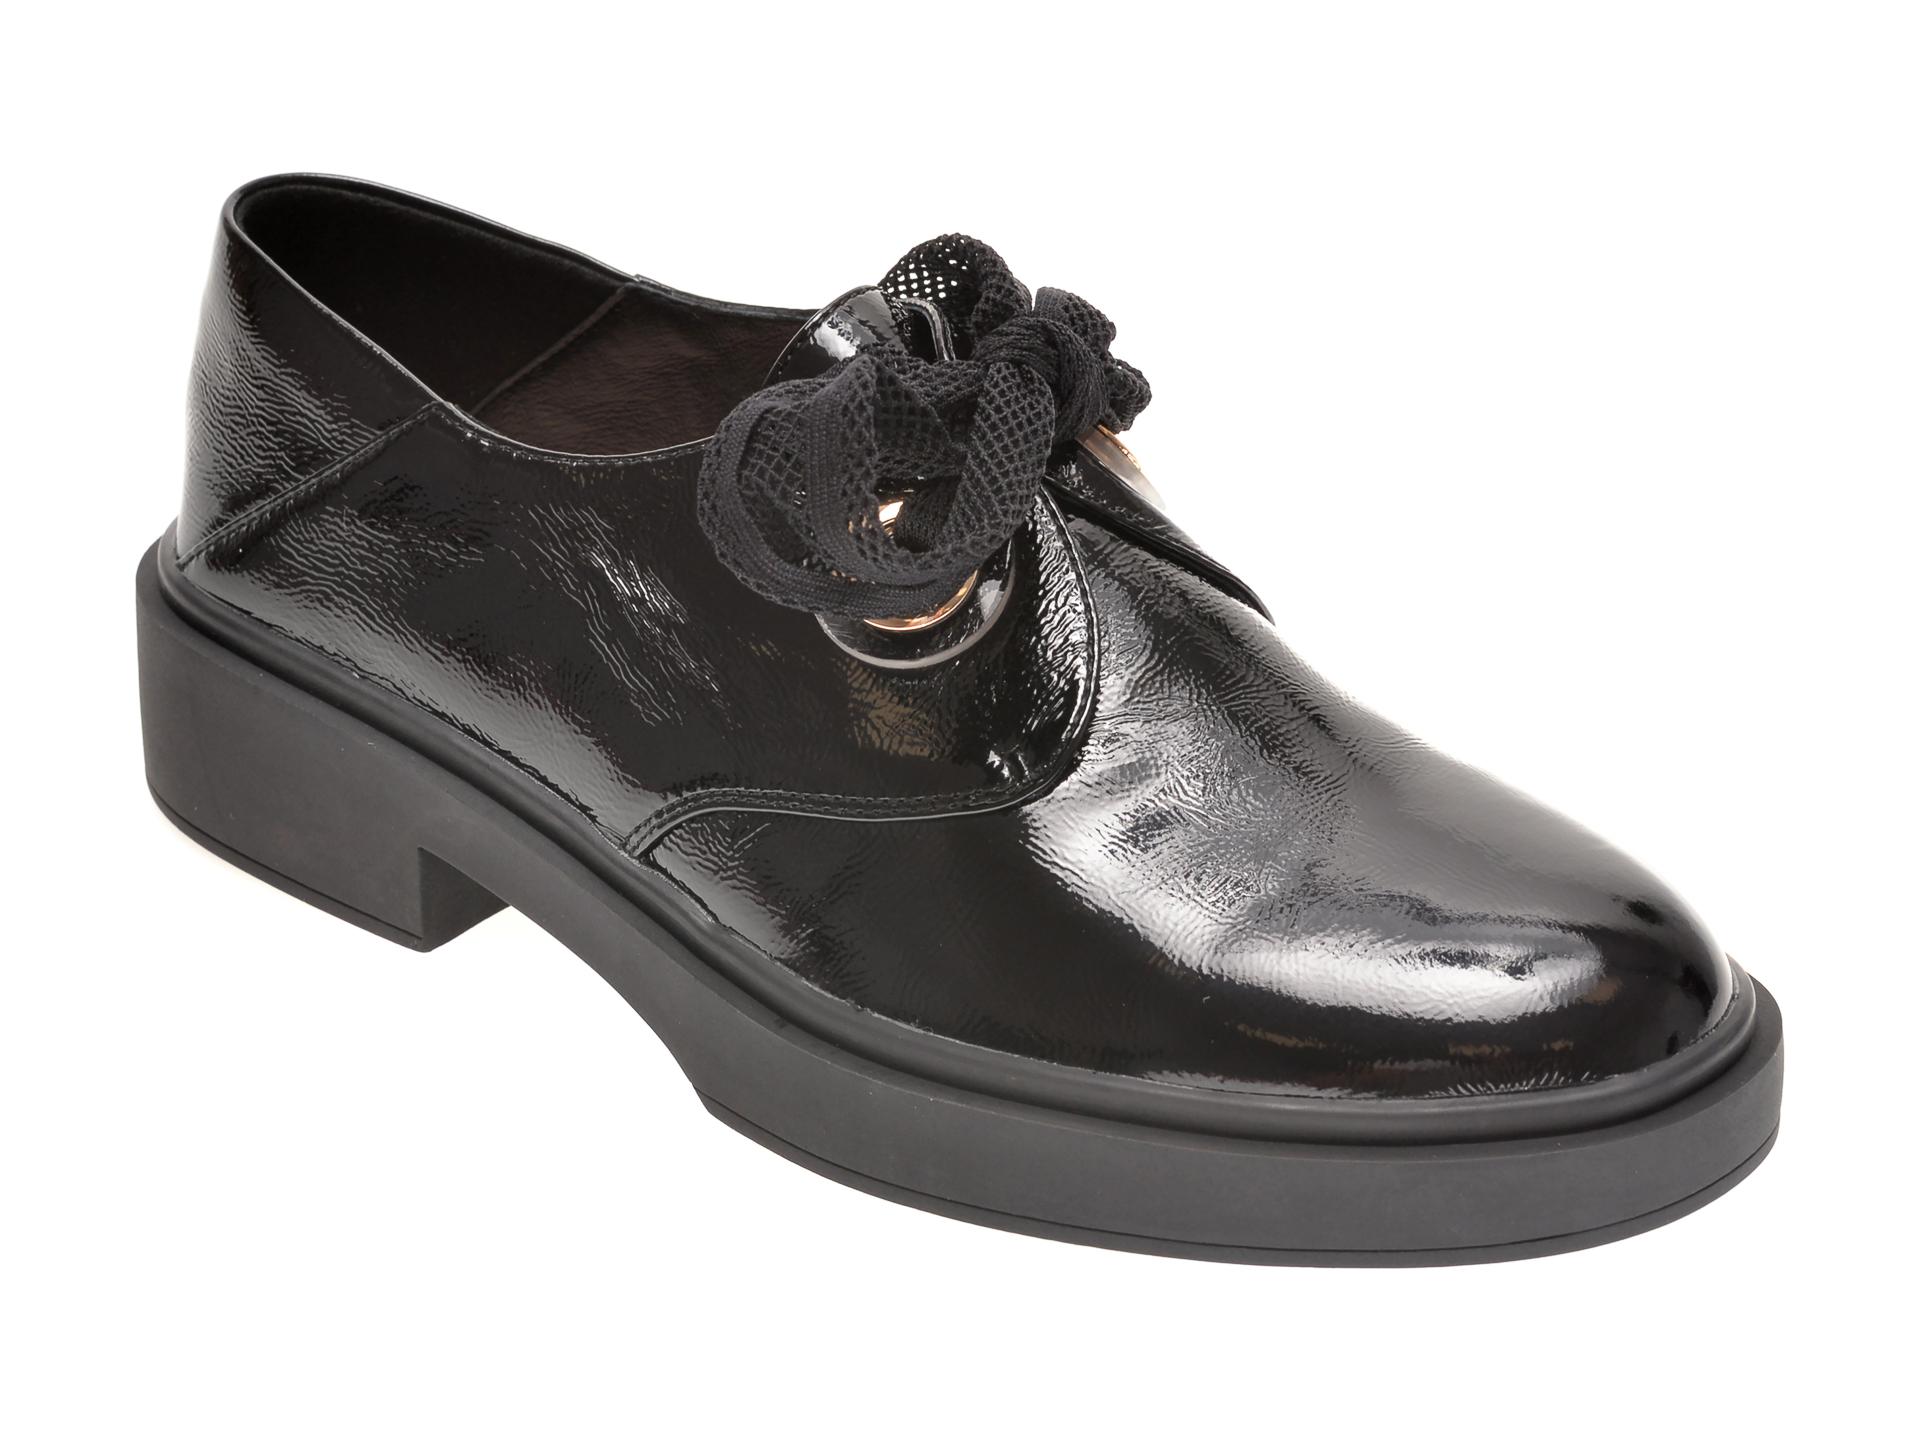 Pantofi EPICA negri, G803R51, din piele naturala lacuita imagine